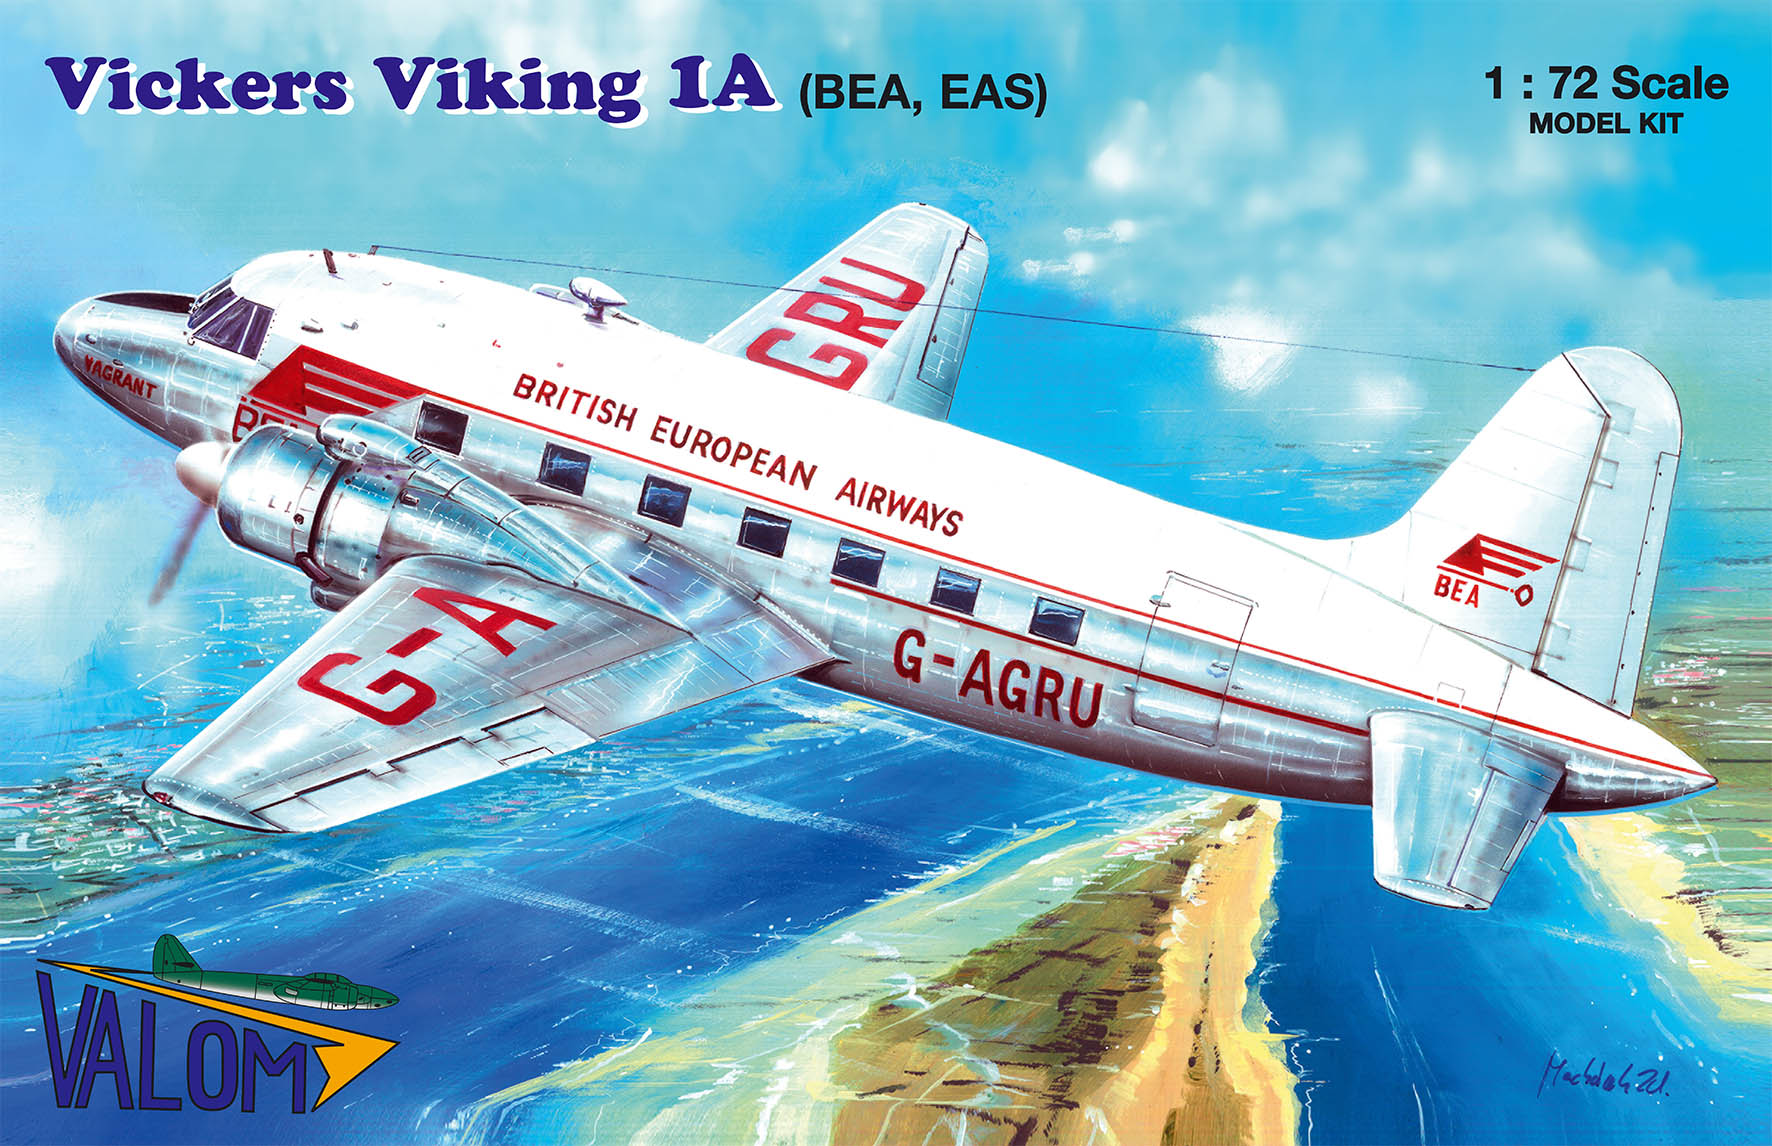 Valom Vickers Viking 1A (BEA, EAS)